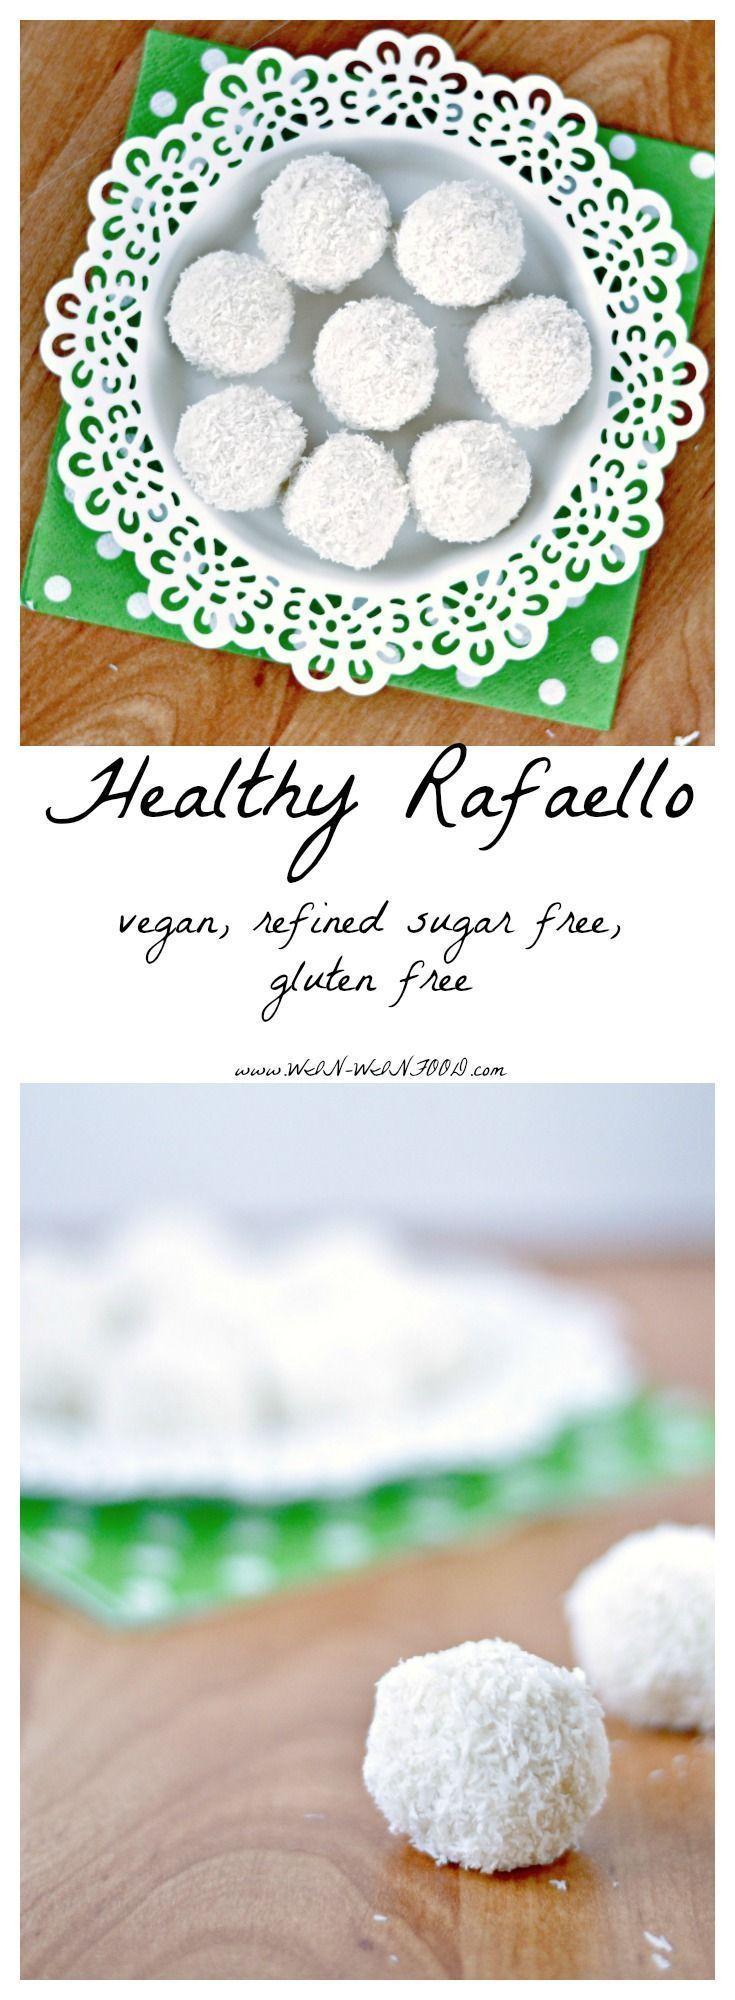 Healthy Raffaello #Vegan #GlutenFree #SugarFree | WIN-WINFOOD.com